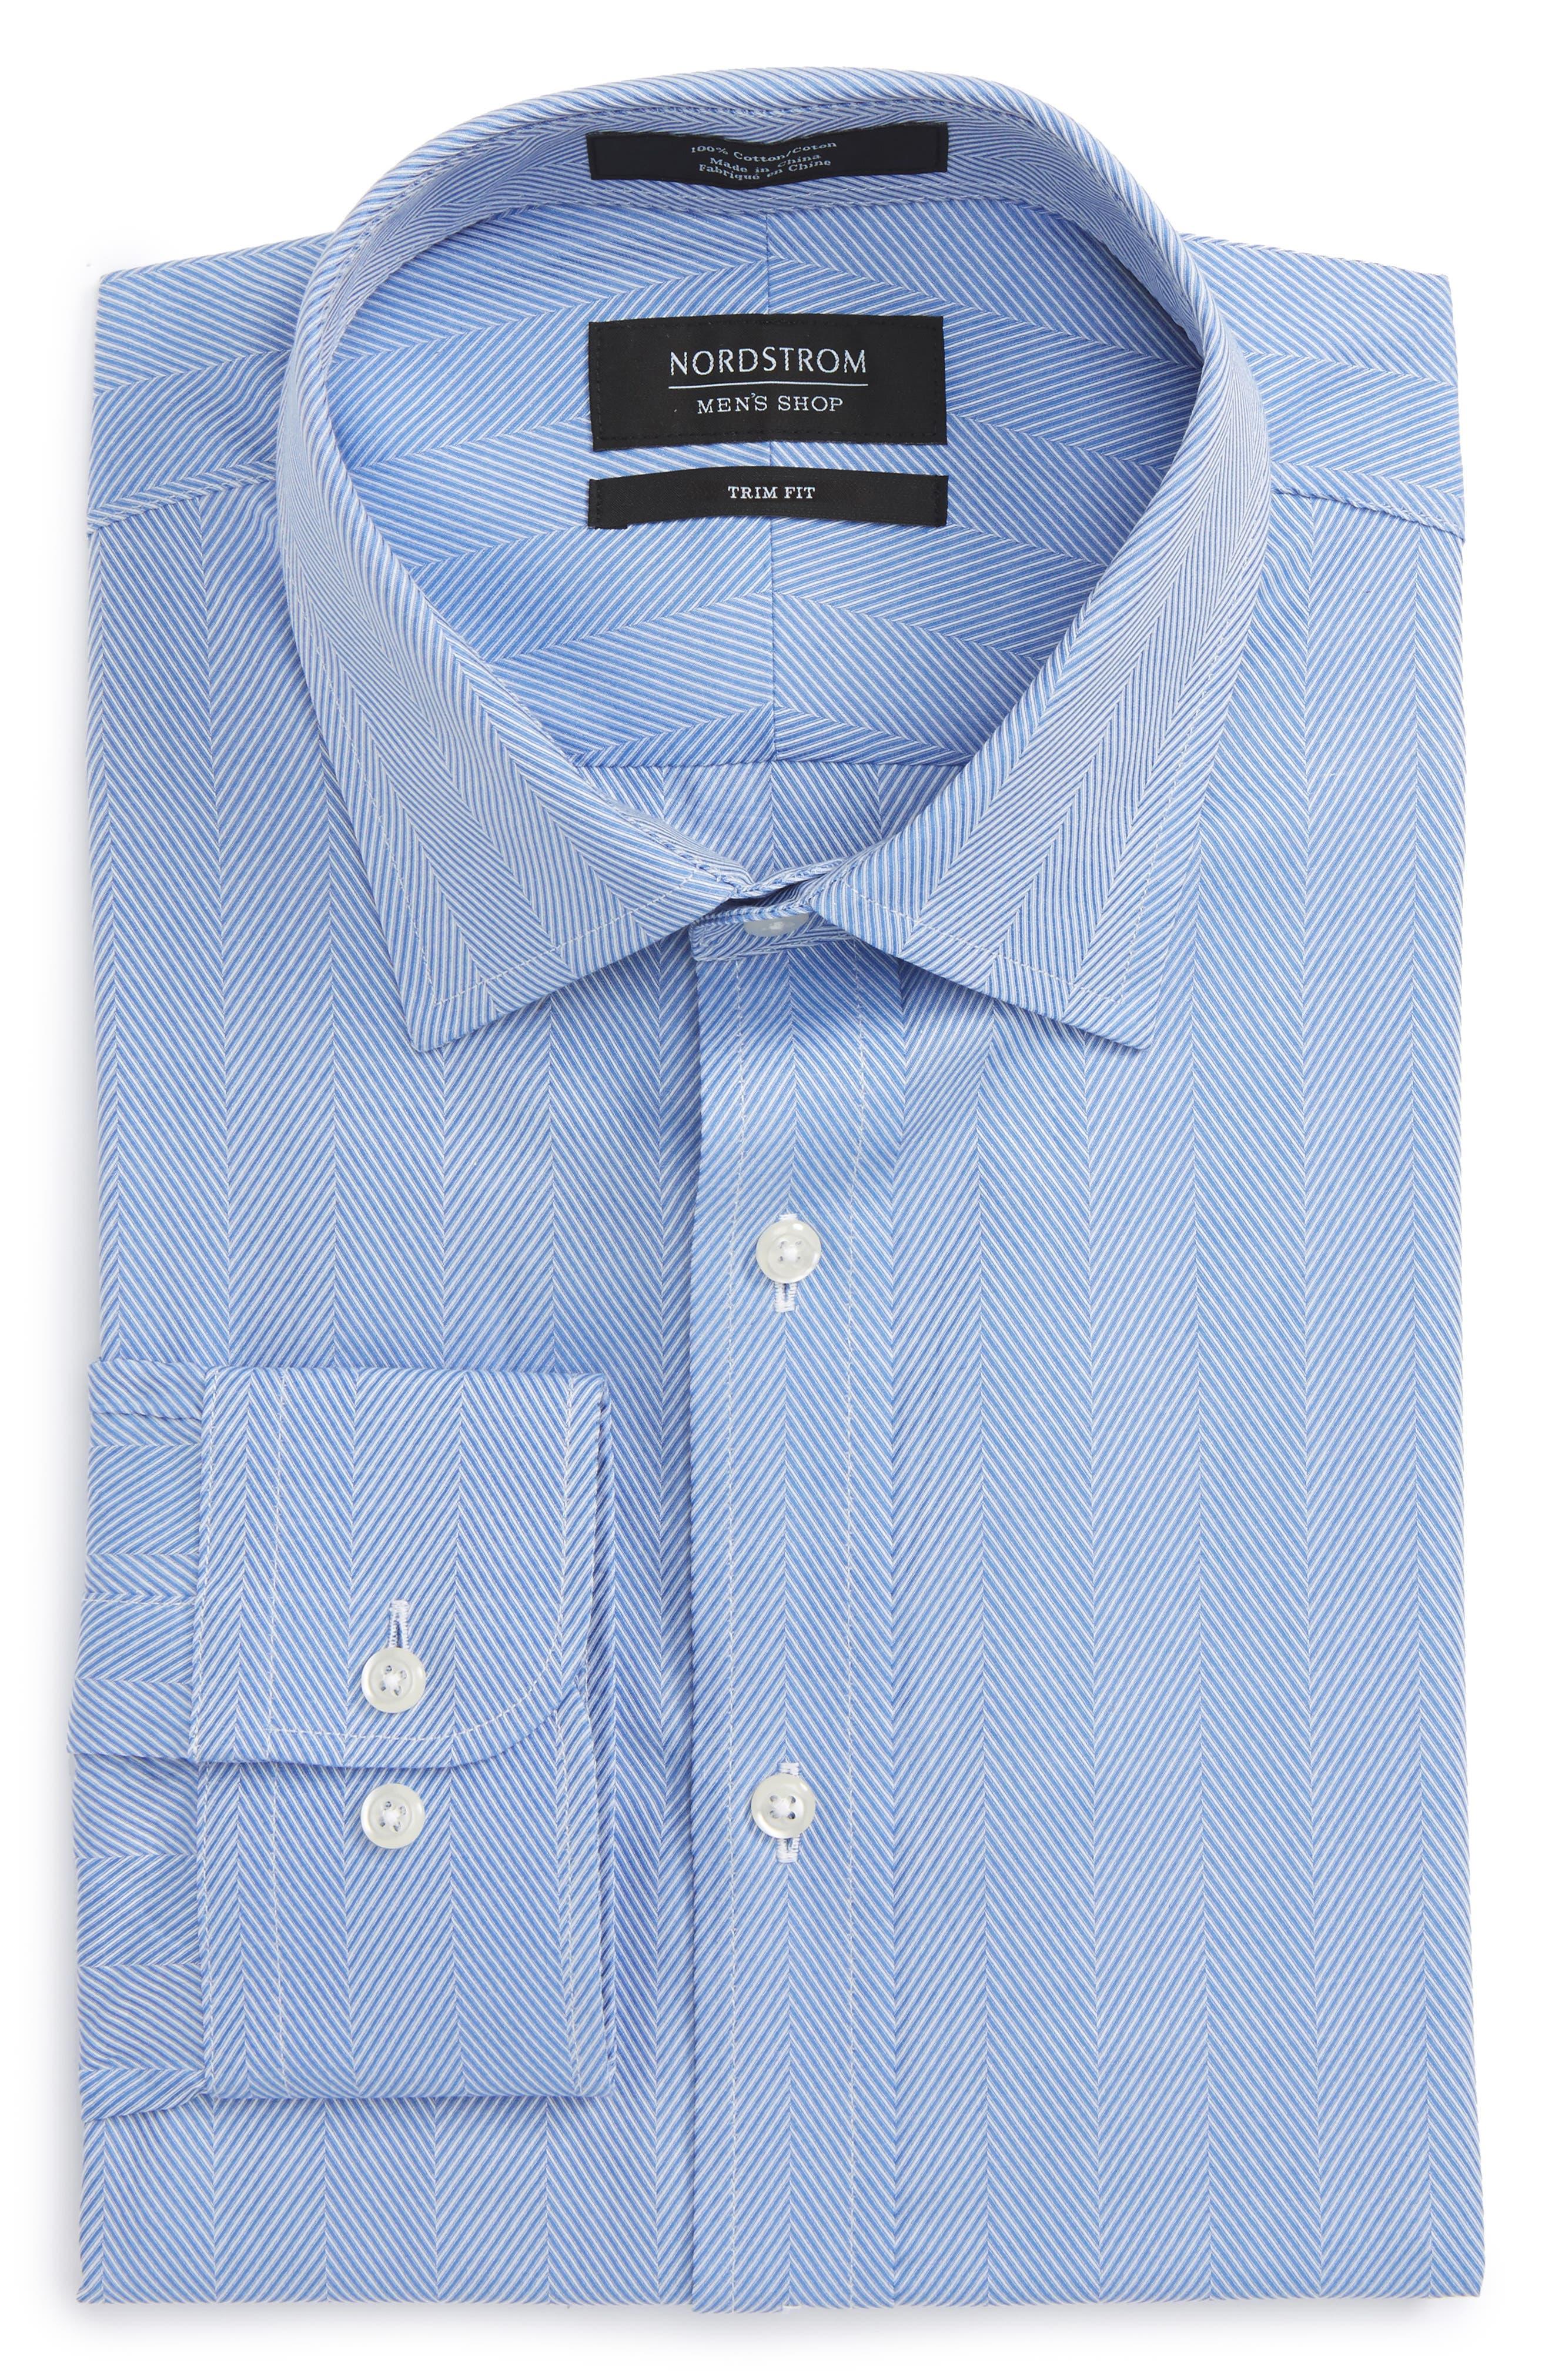 Nordstrom Men's Shop Trim Fit Herringbone Dress Shirt